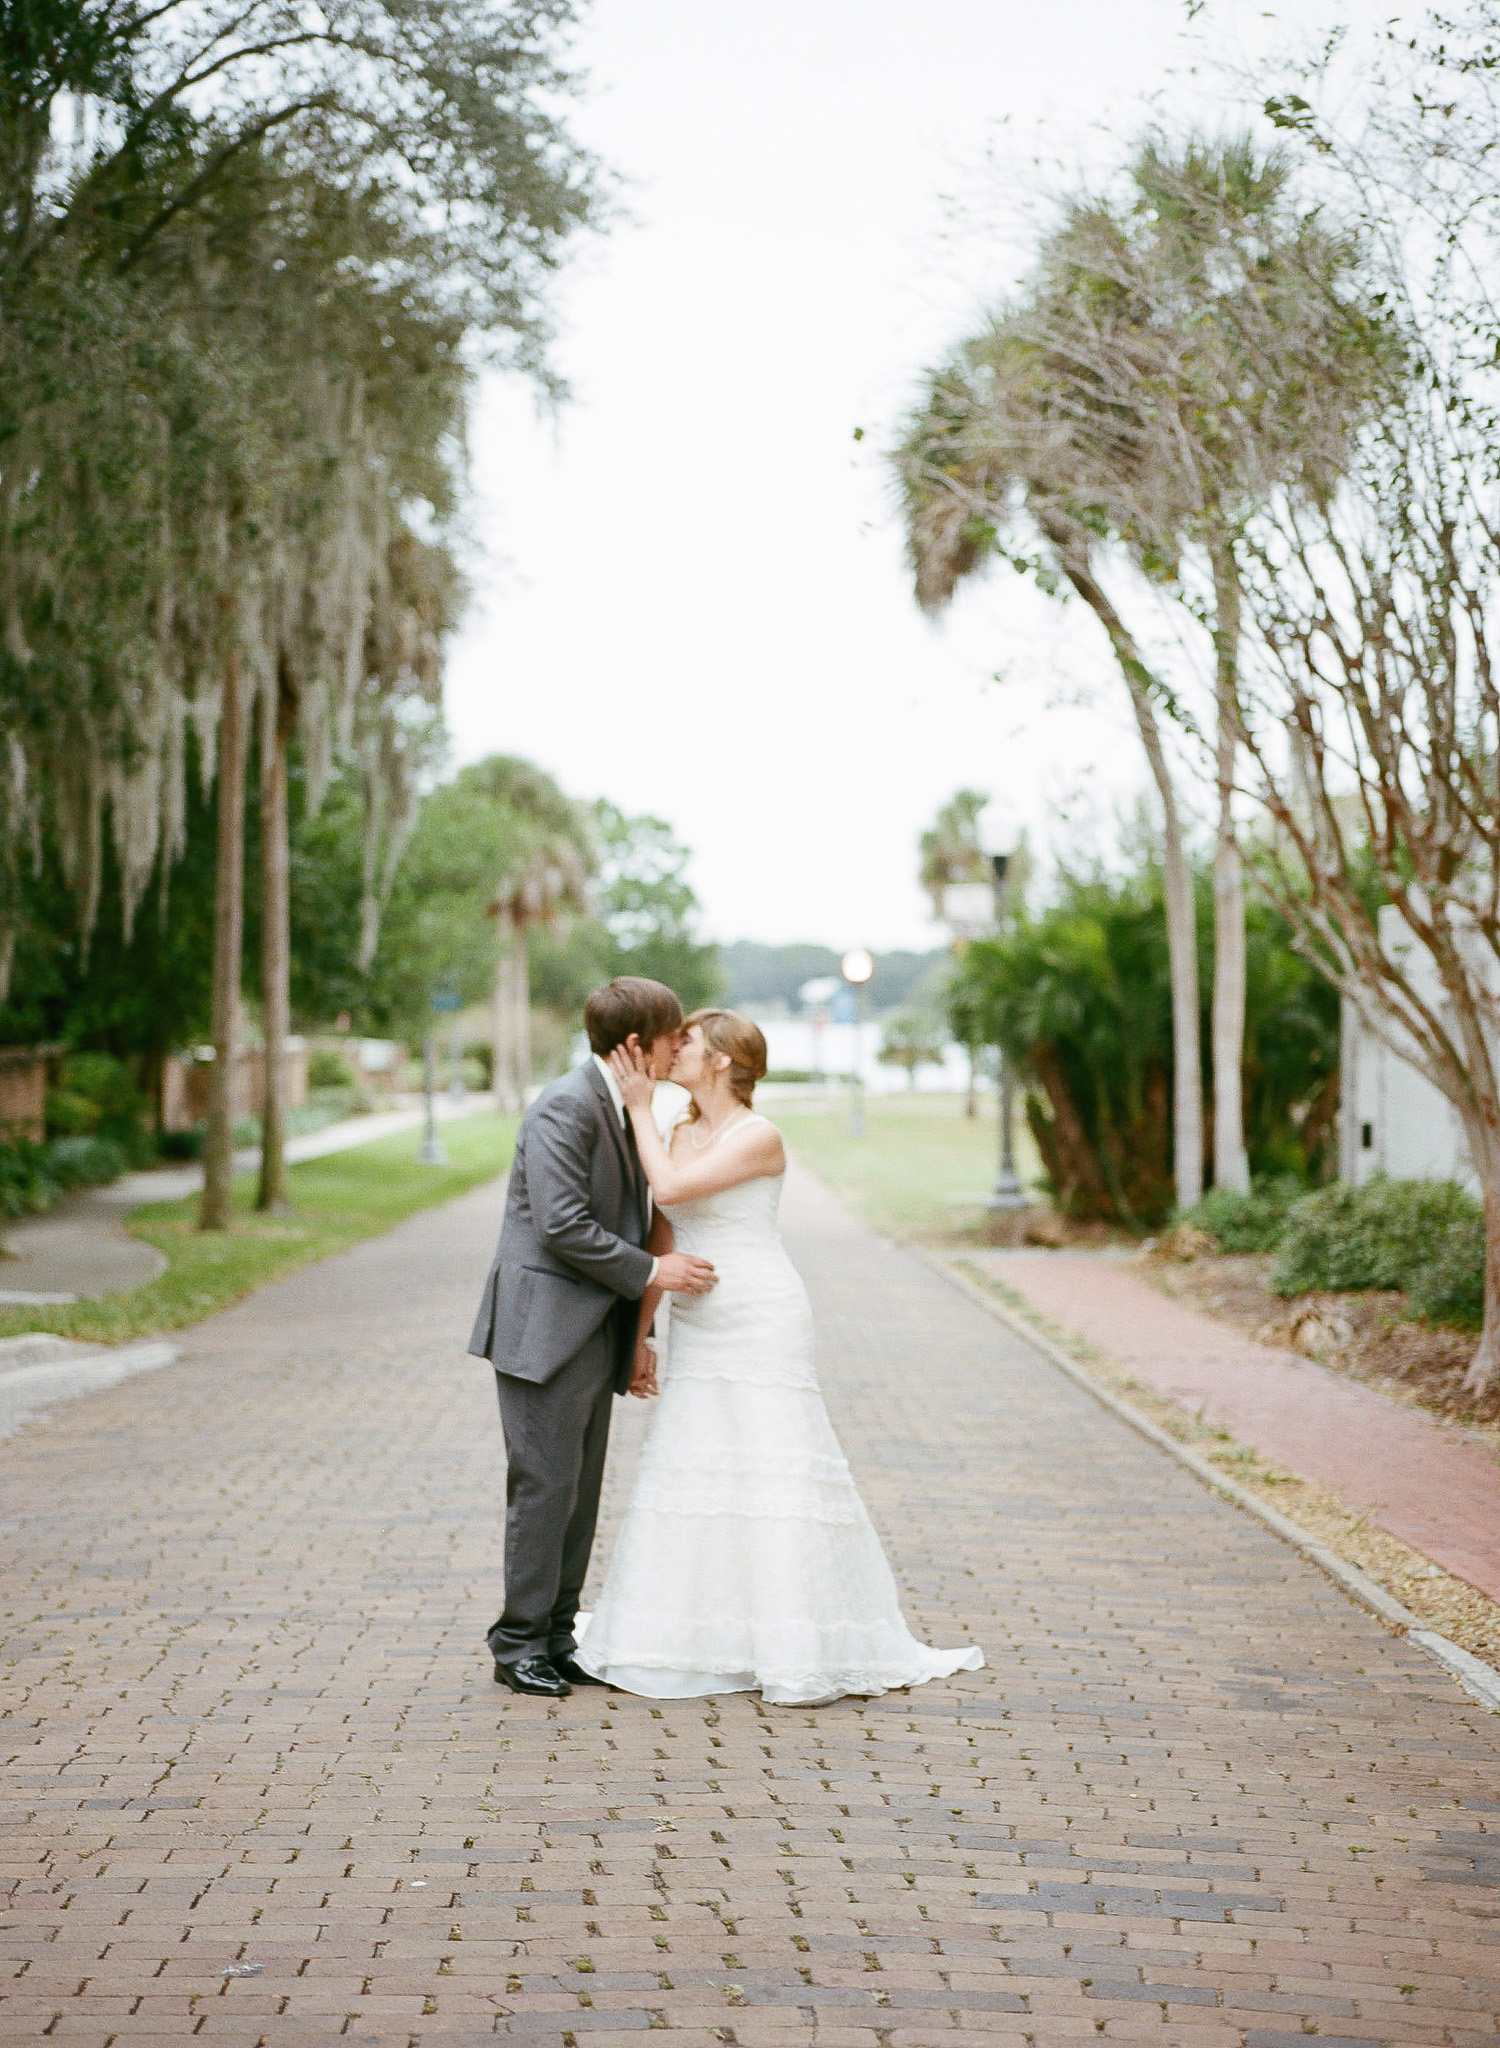 Christina-Matt-Maitland-Art-Center-Wedding49.JPG